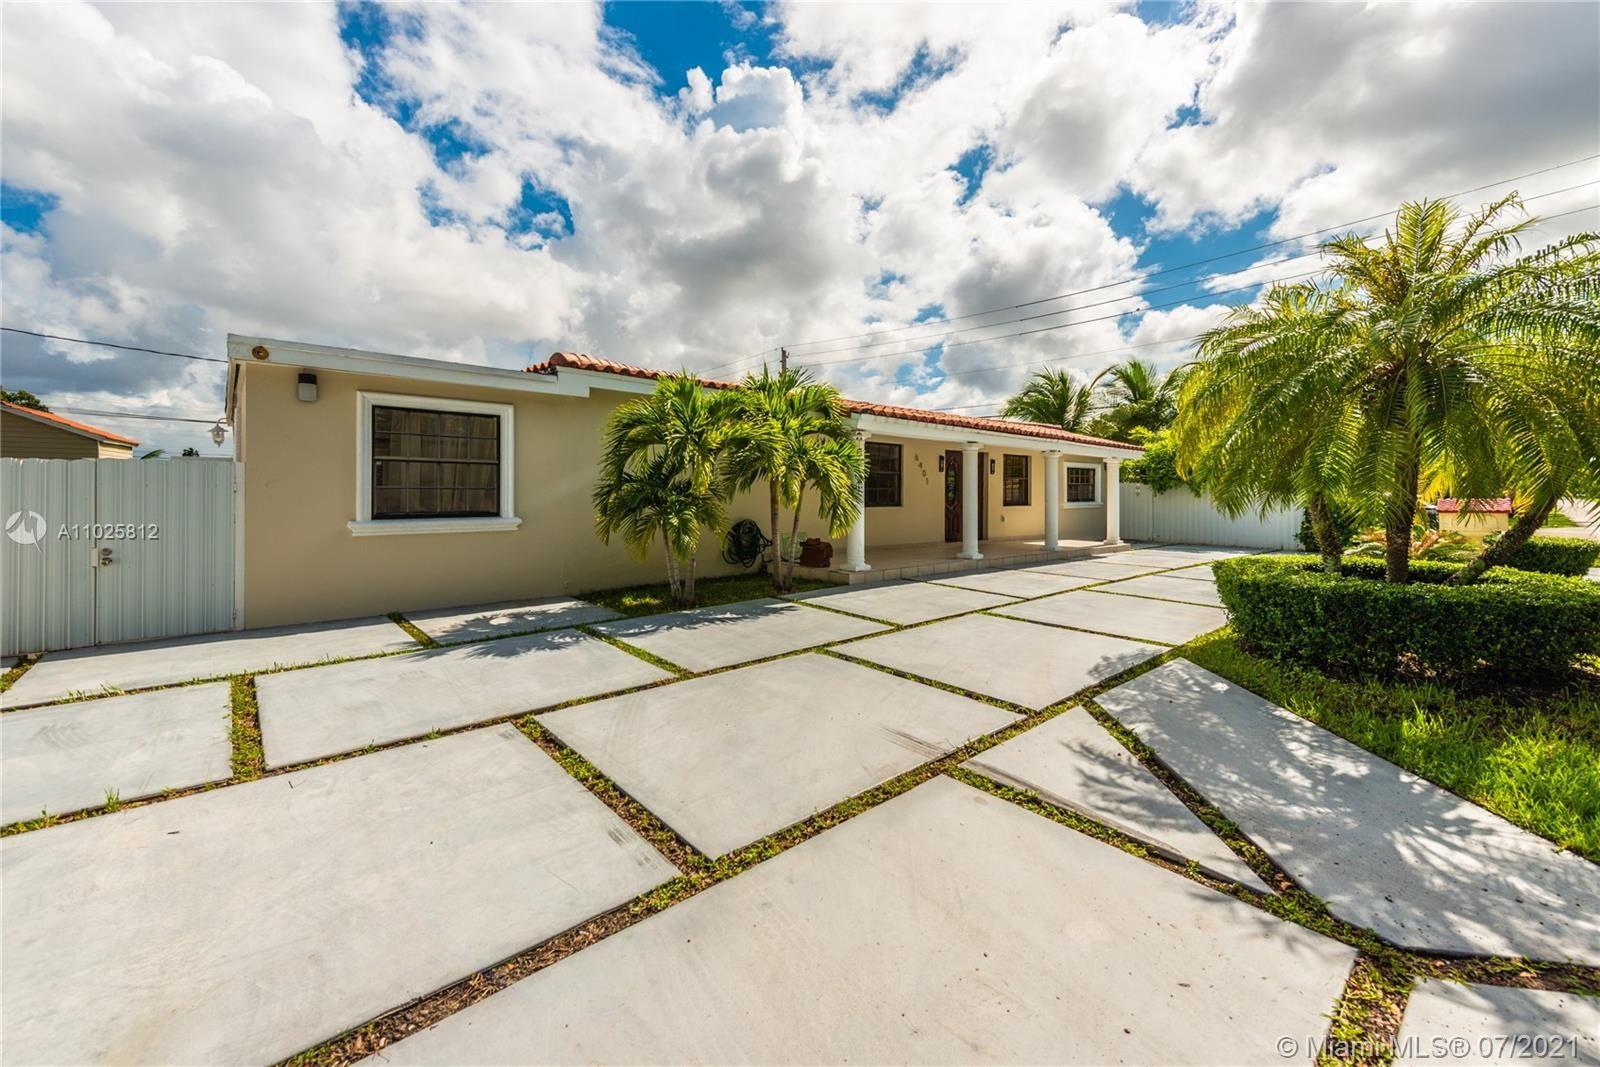 Photo of 6401 SW 33rd St, Miami, FL 33155 (MLS # A11025812)